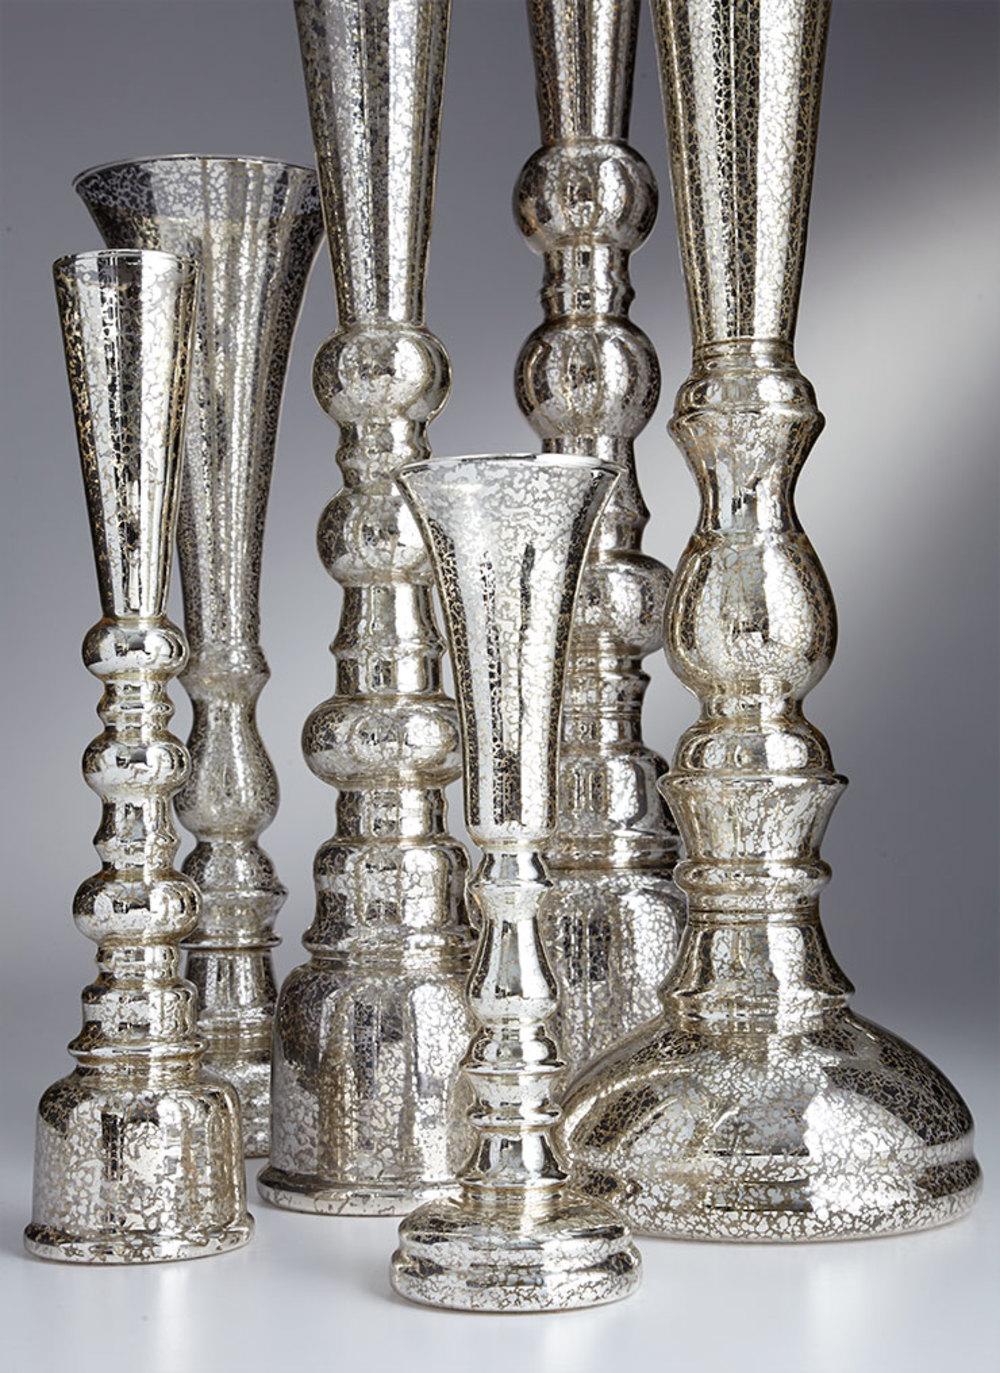 Cyan Designs - Large Shimer Vase